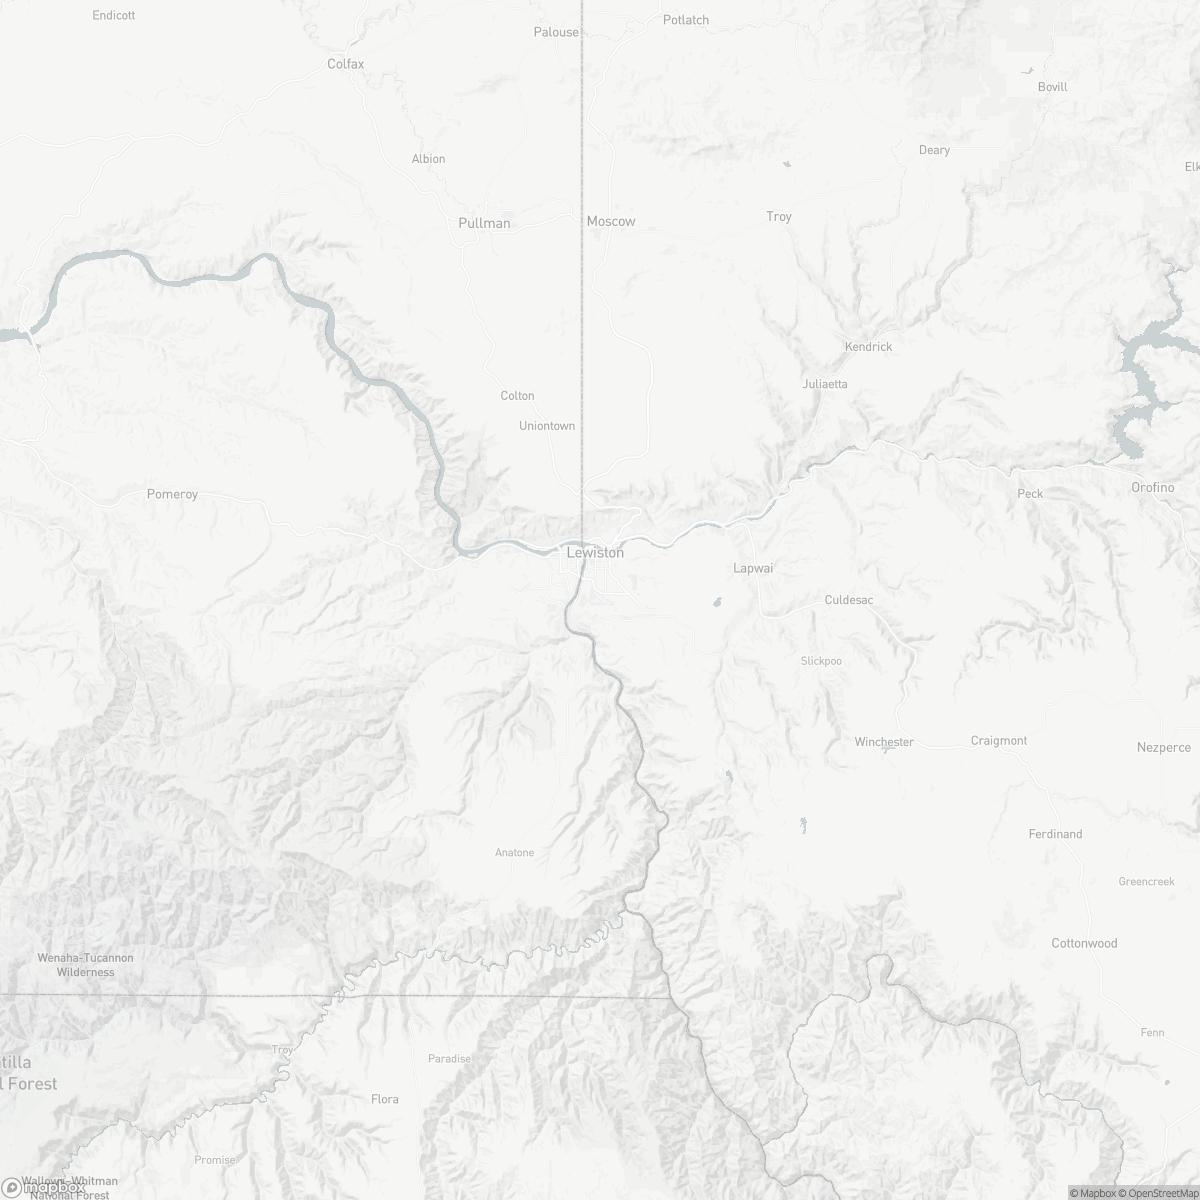 Map of Lewiston Nez Perce County Airport LWS surrounding area of Lewiston Idaho